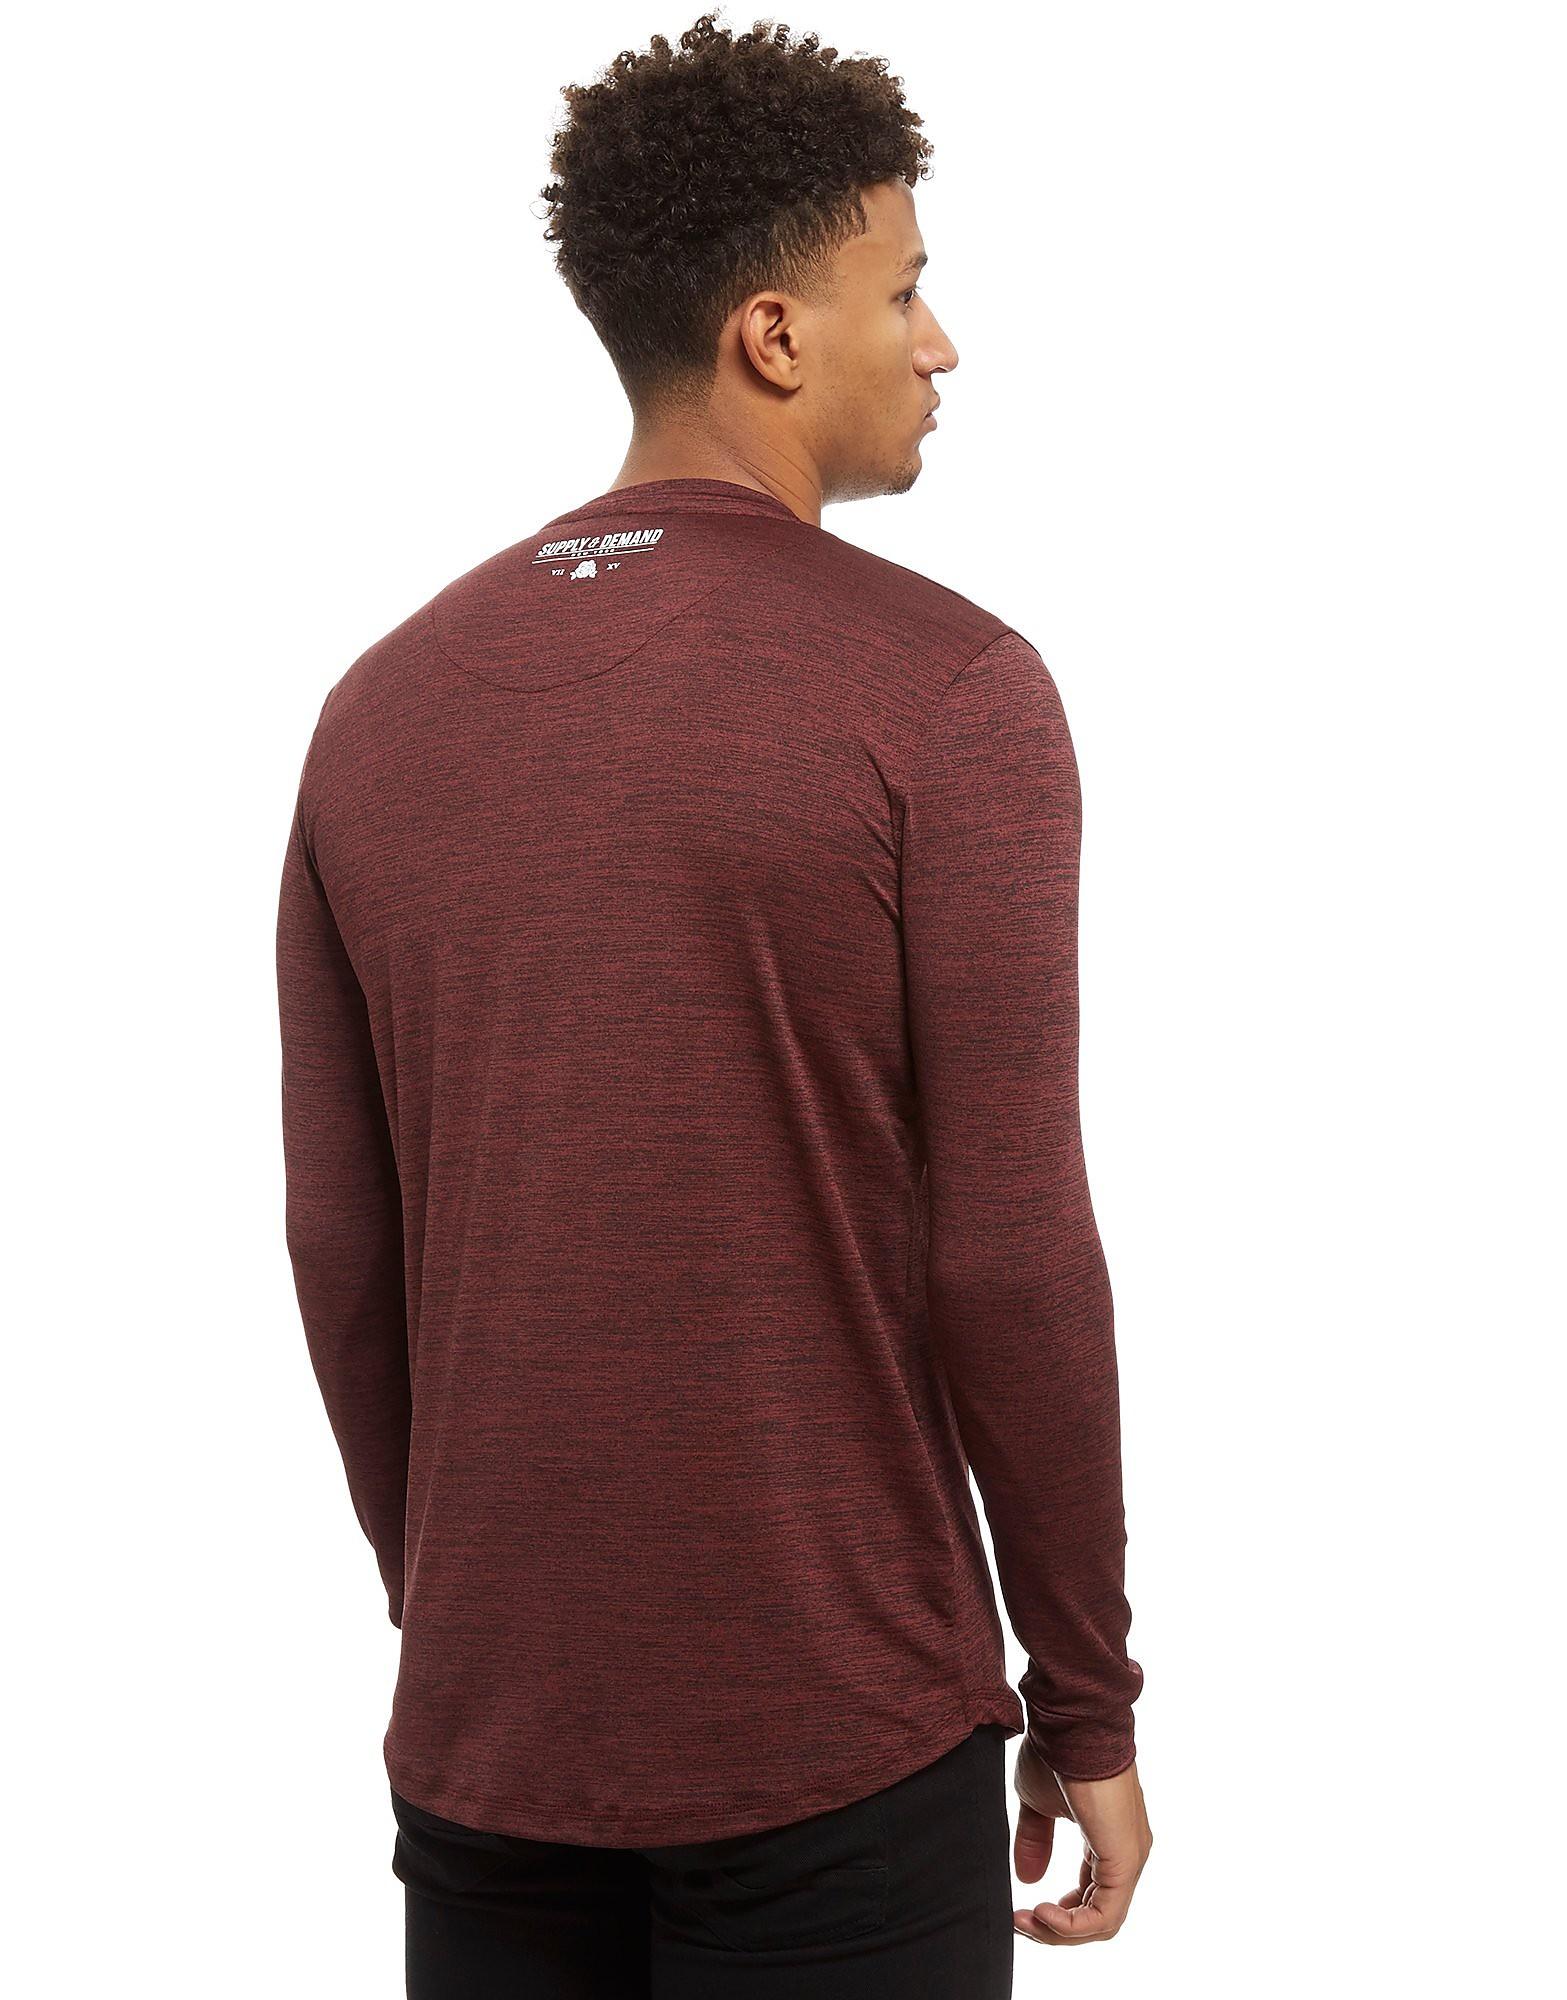 Supply & Demand Truffle Hendrick Long Sleeve T-Shirt